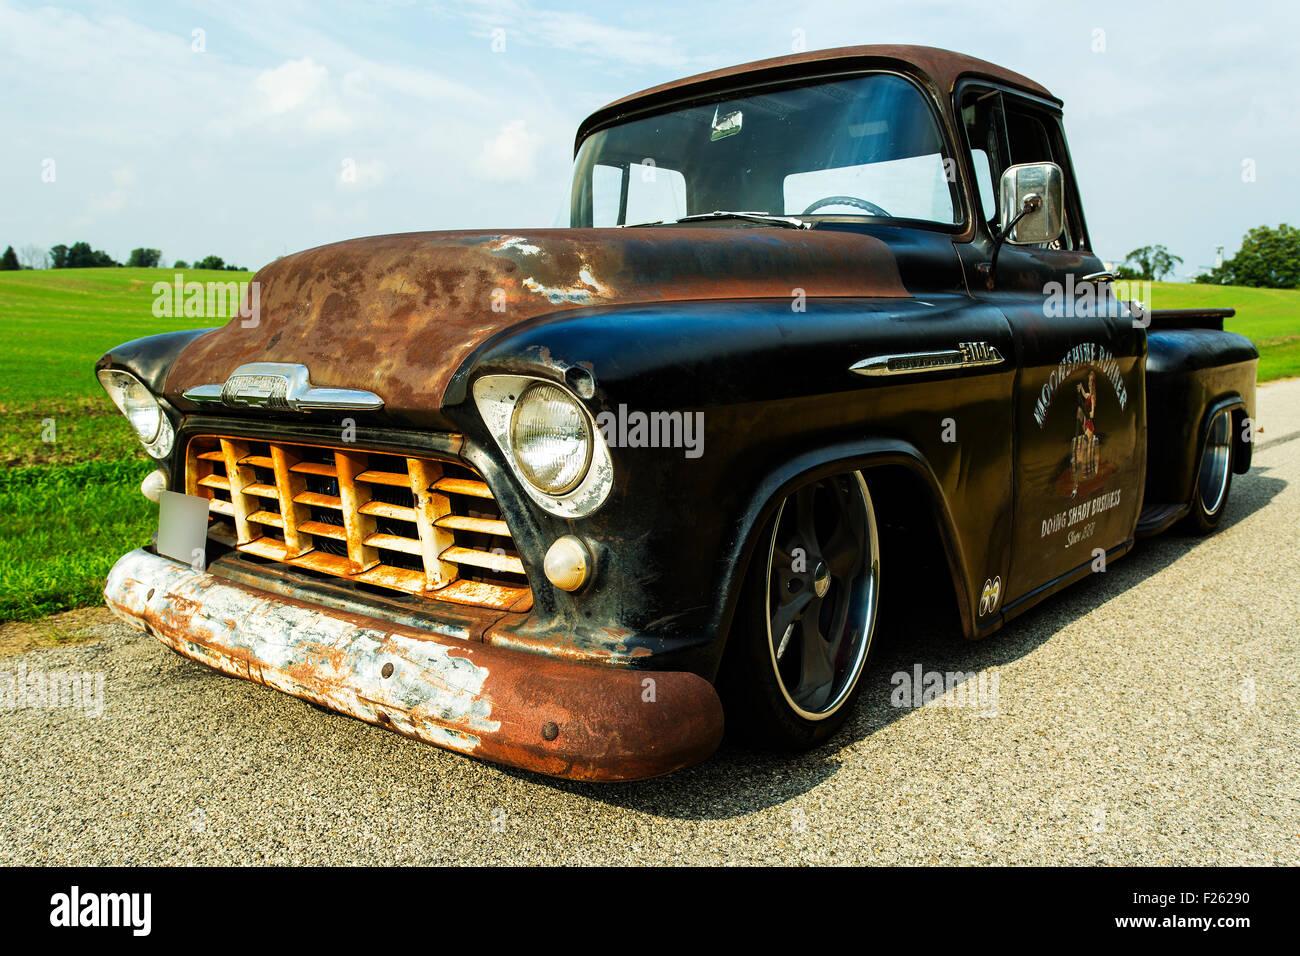 1956 Chevrolet Custom Rat Rod Pickup Truck Stock Photo: 87414684 - Alamy